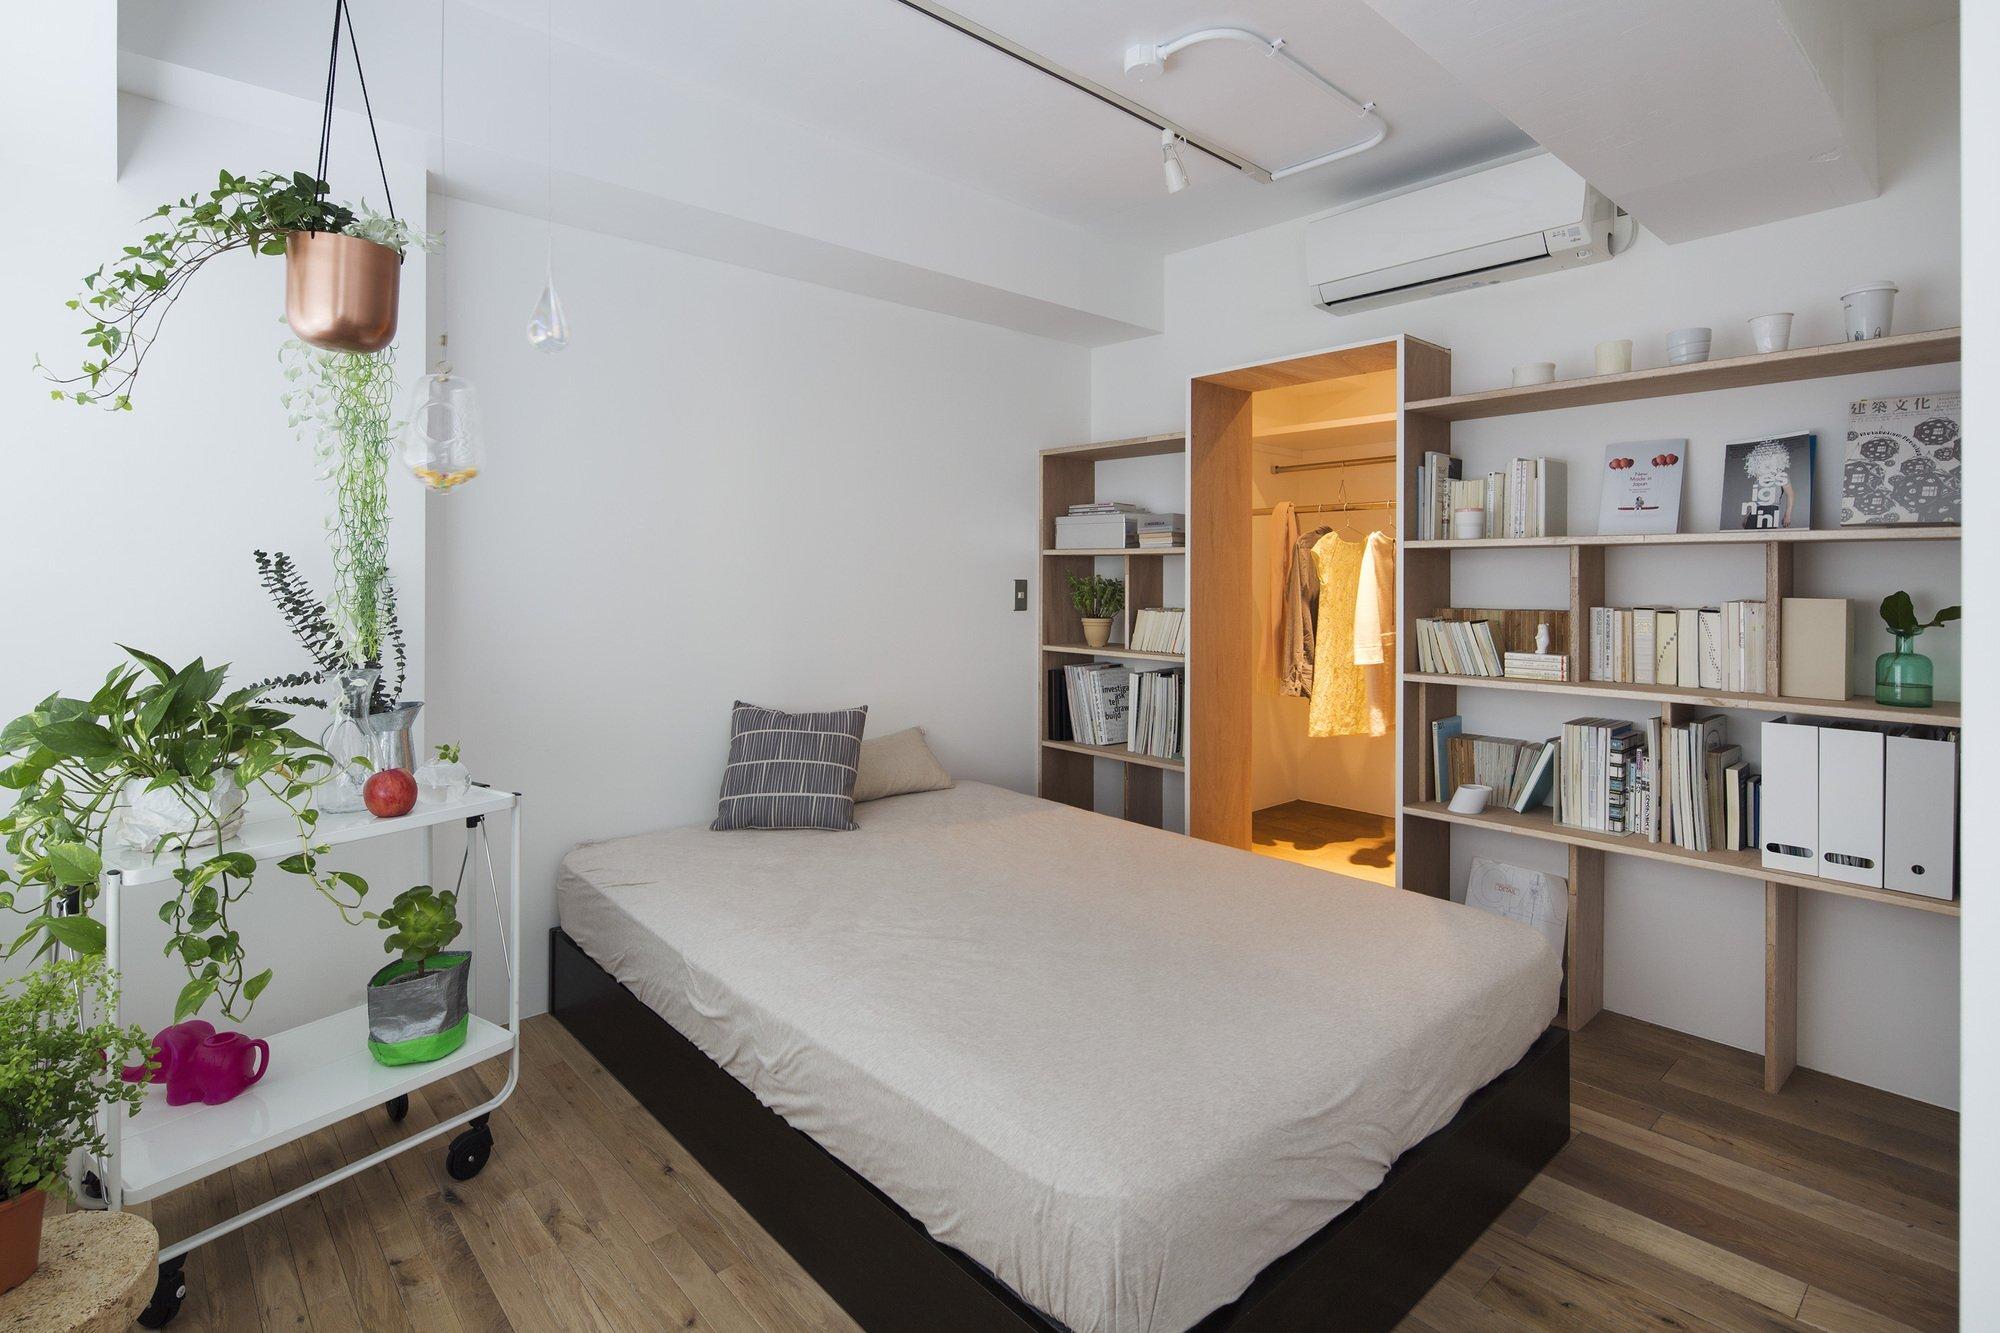 Opera   Taka Shinomoto And Voar Design Haus   Small Apartment In Tokyo    Bedroom